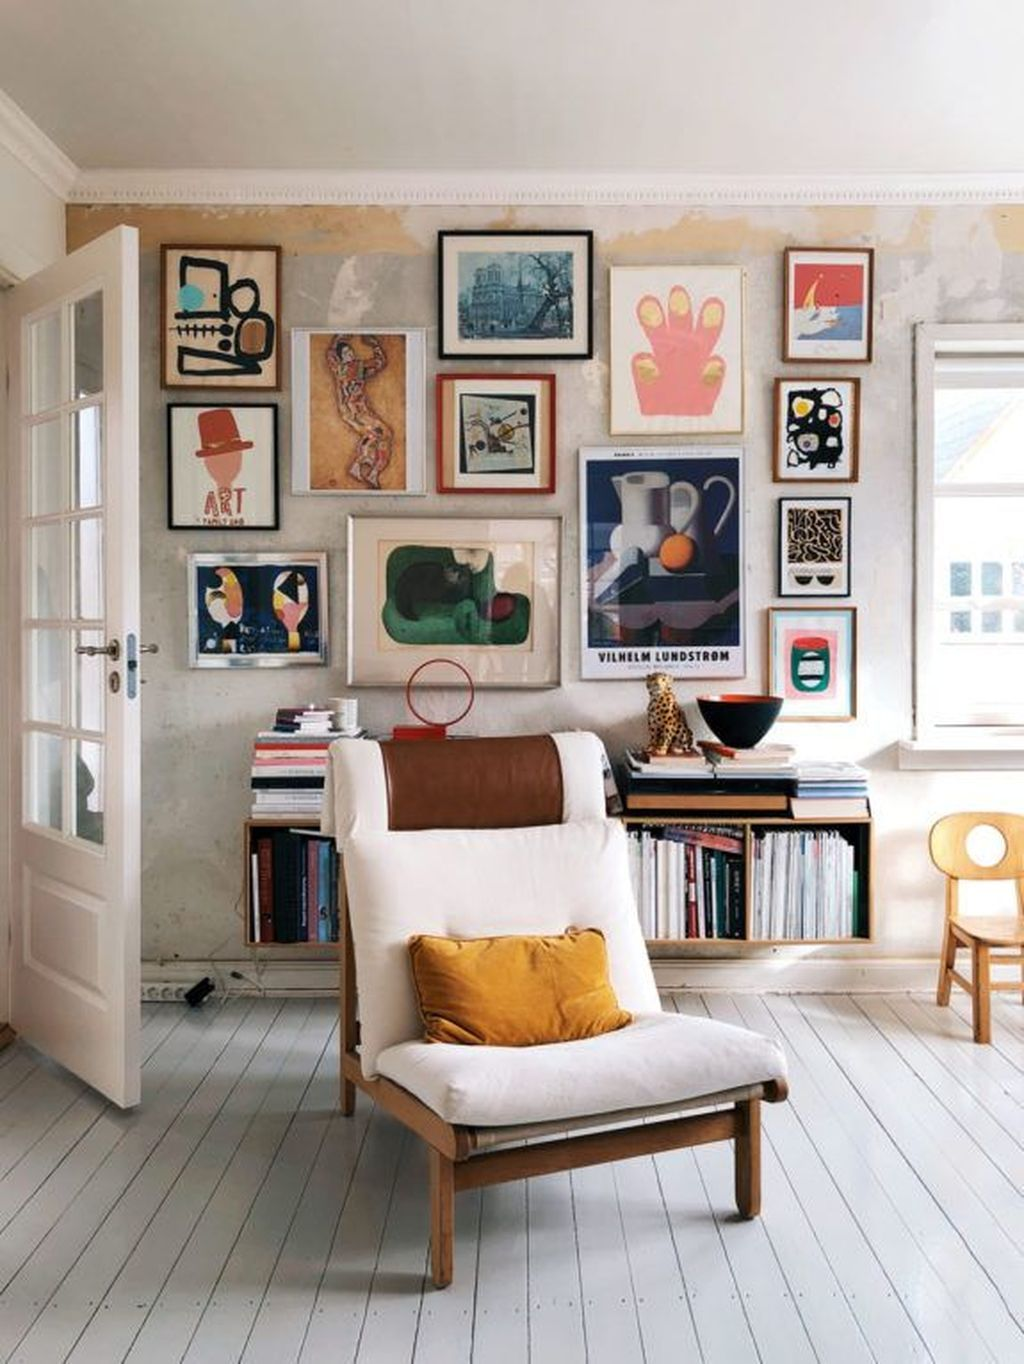 30 Beautiful Gallery Wall Decor Ideas To Show Photos Makkelijke Huis Decoratie Huis Interieur Huis Interieur Design